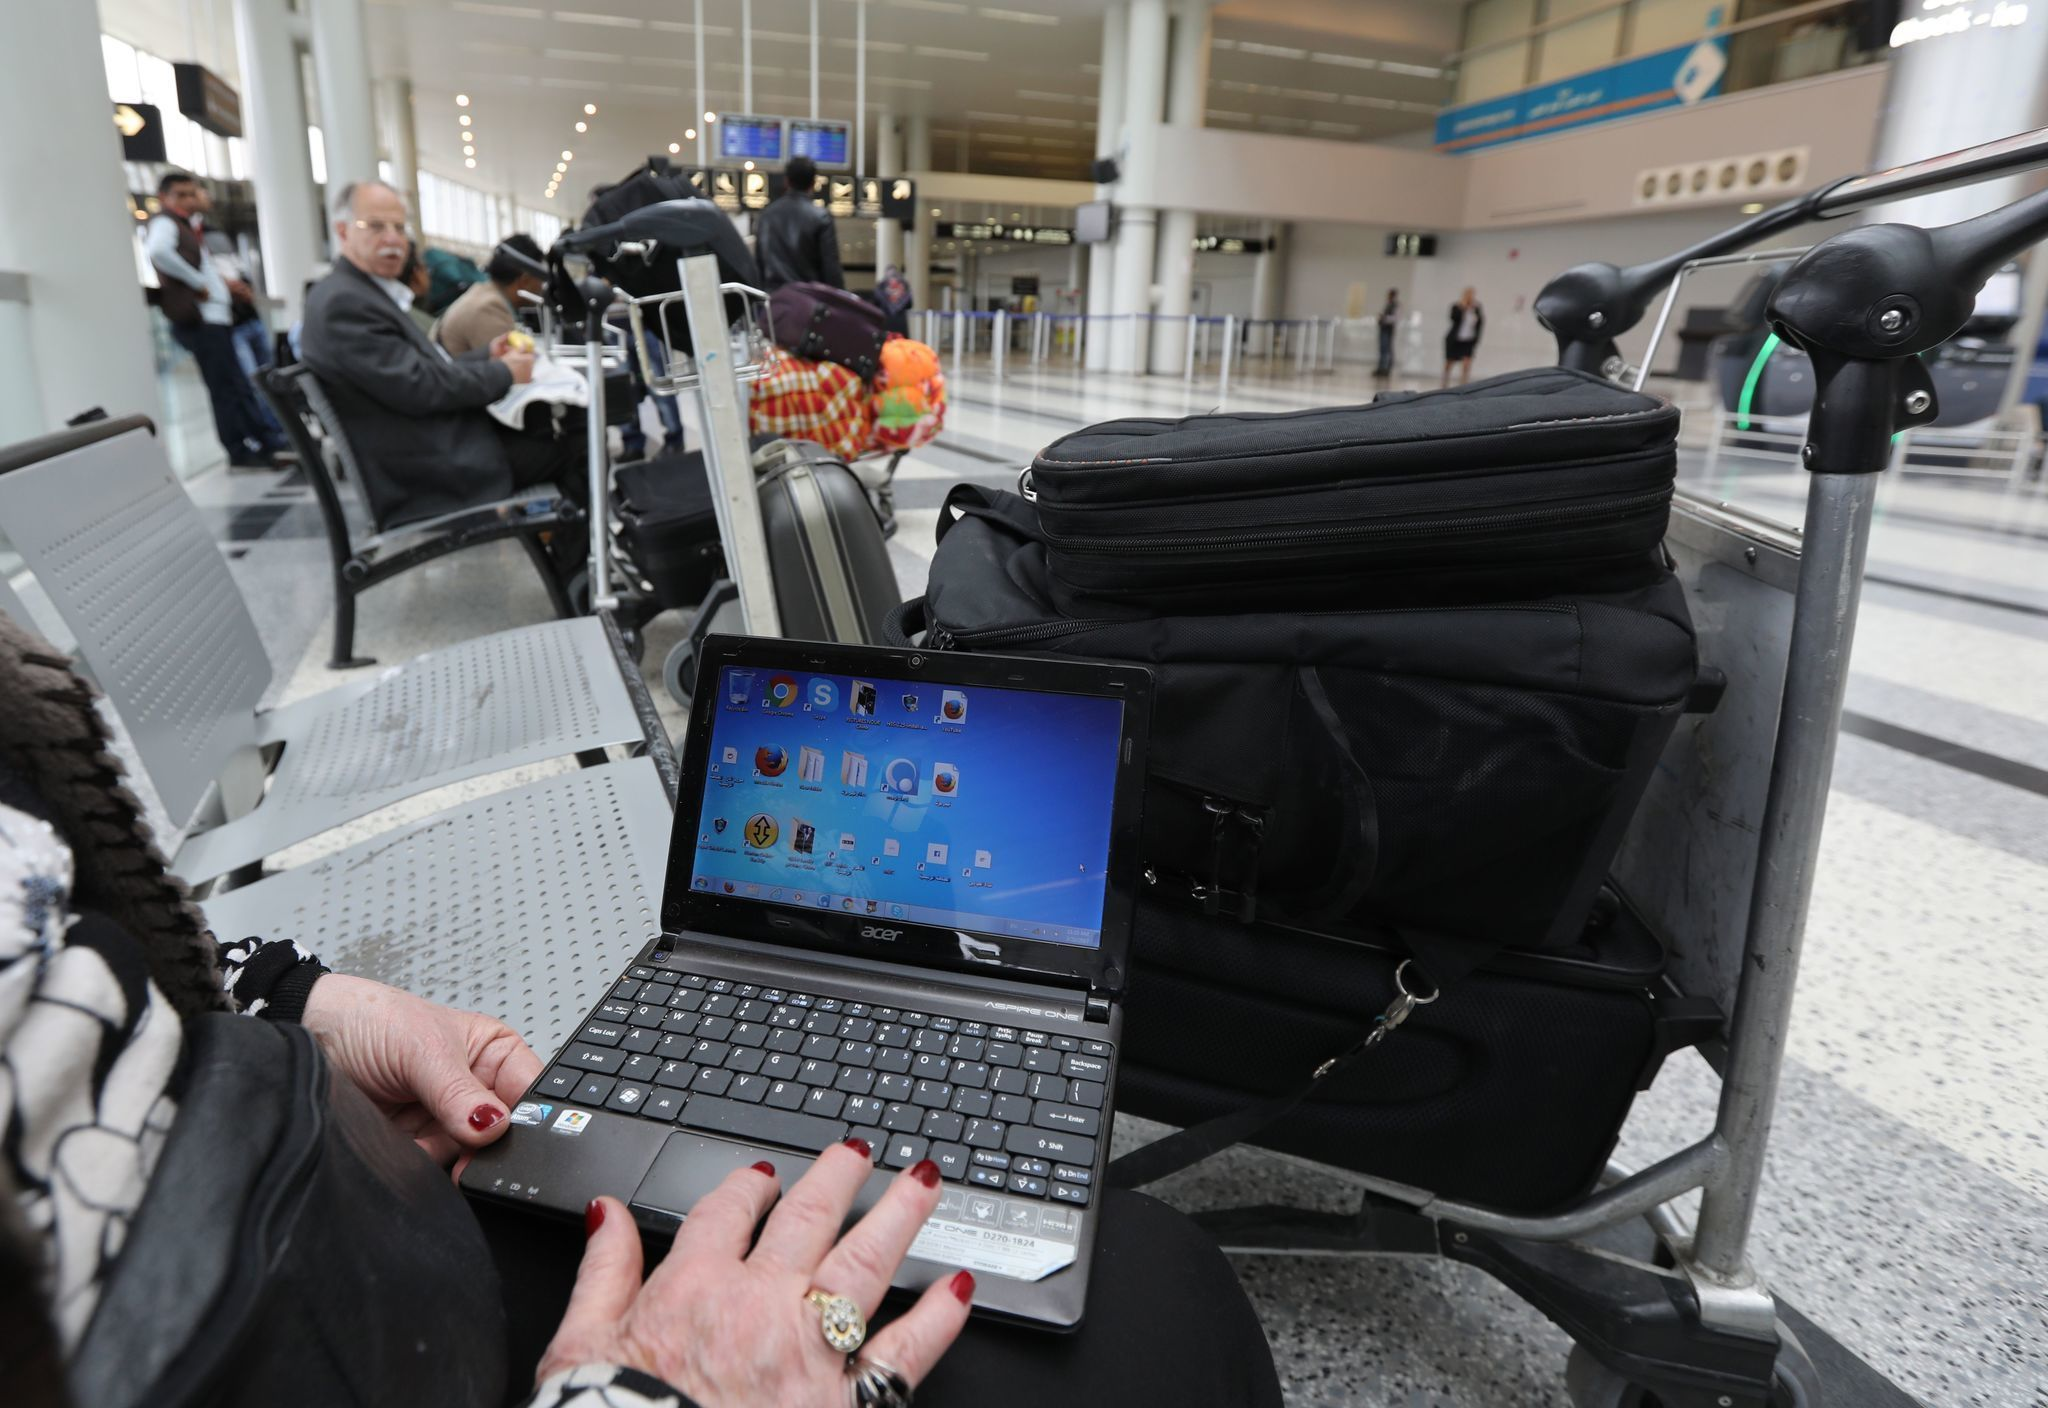 Ct-laptop-bans-passenger-screening-chanes-20170628